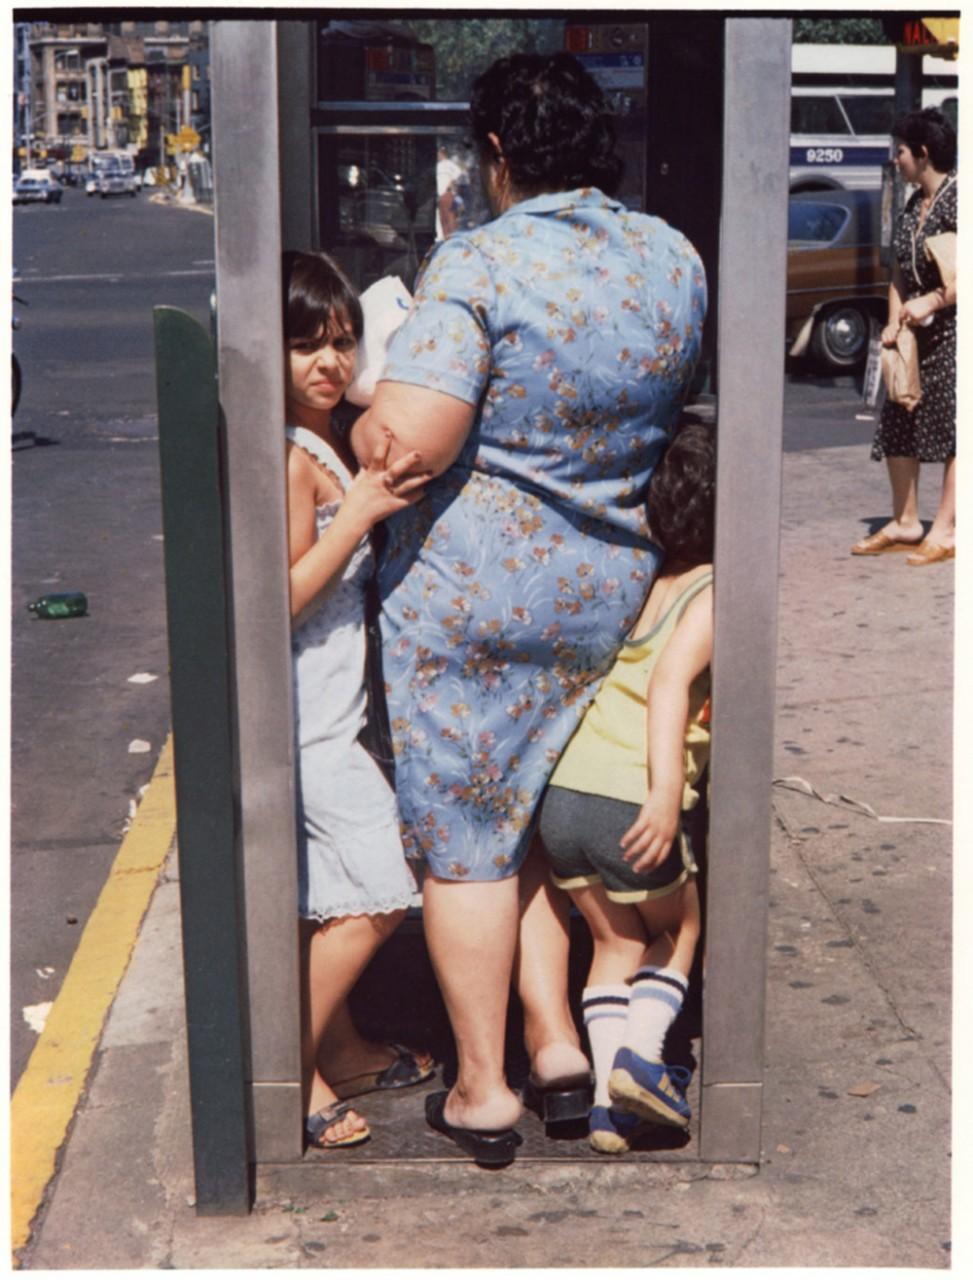 Уличная жизнь Нью-Йорка с 1930-х до 80-х годов в фотографиях Элен Левитт 1